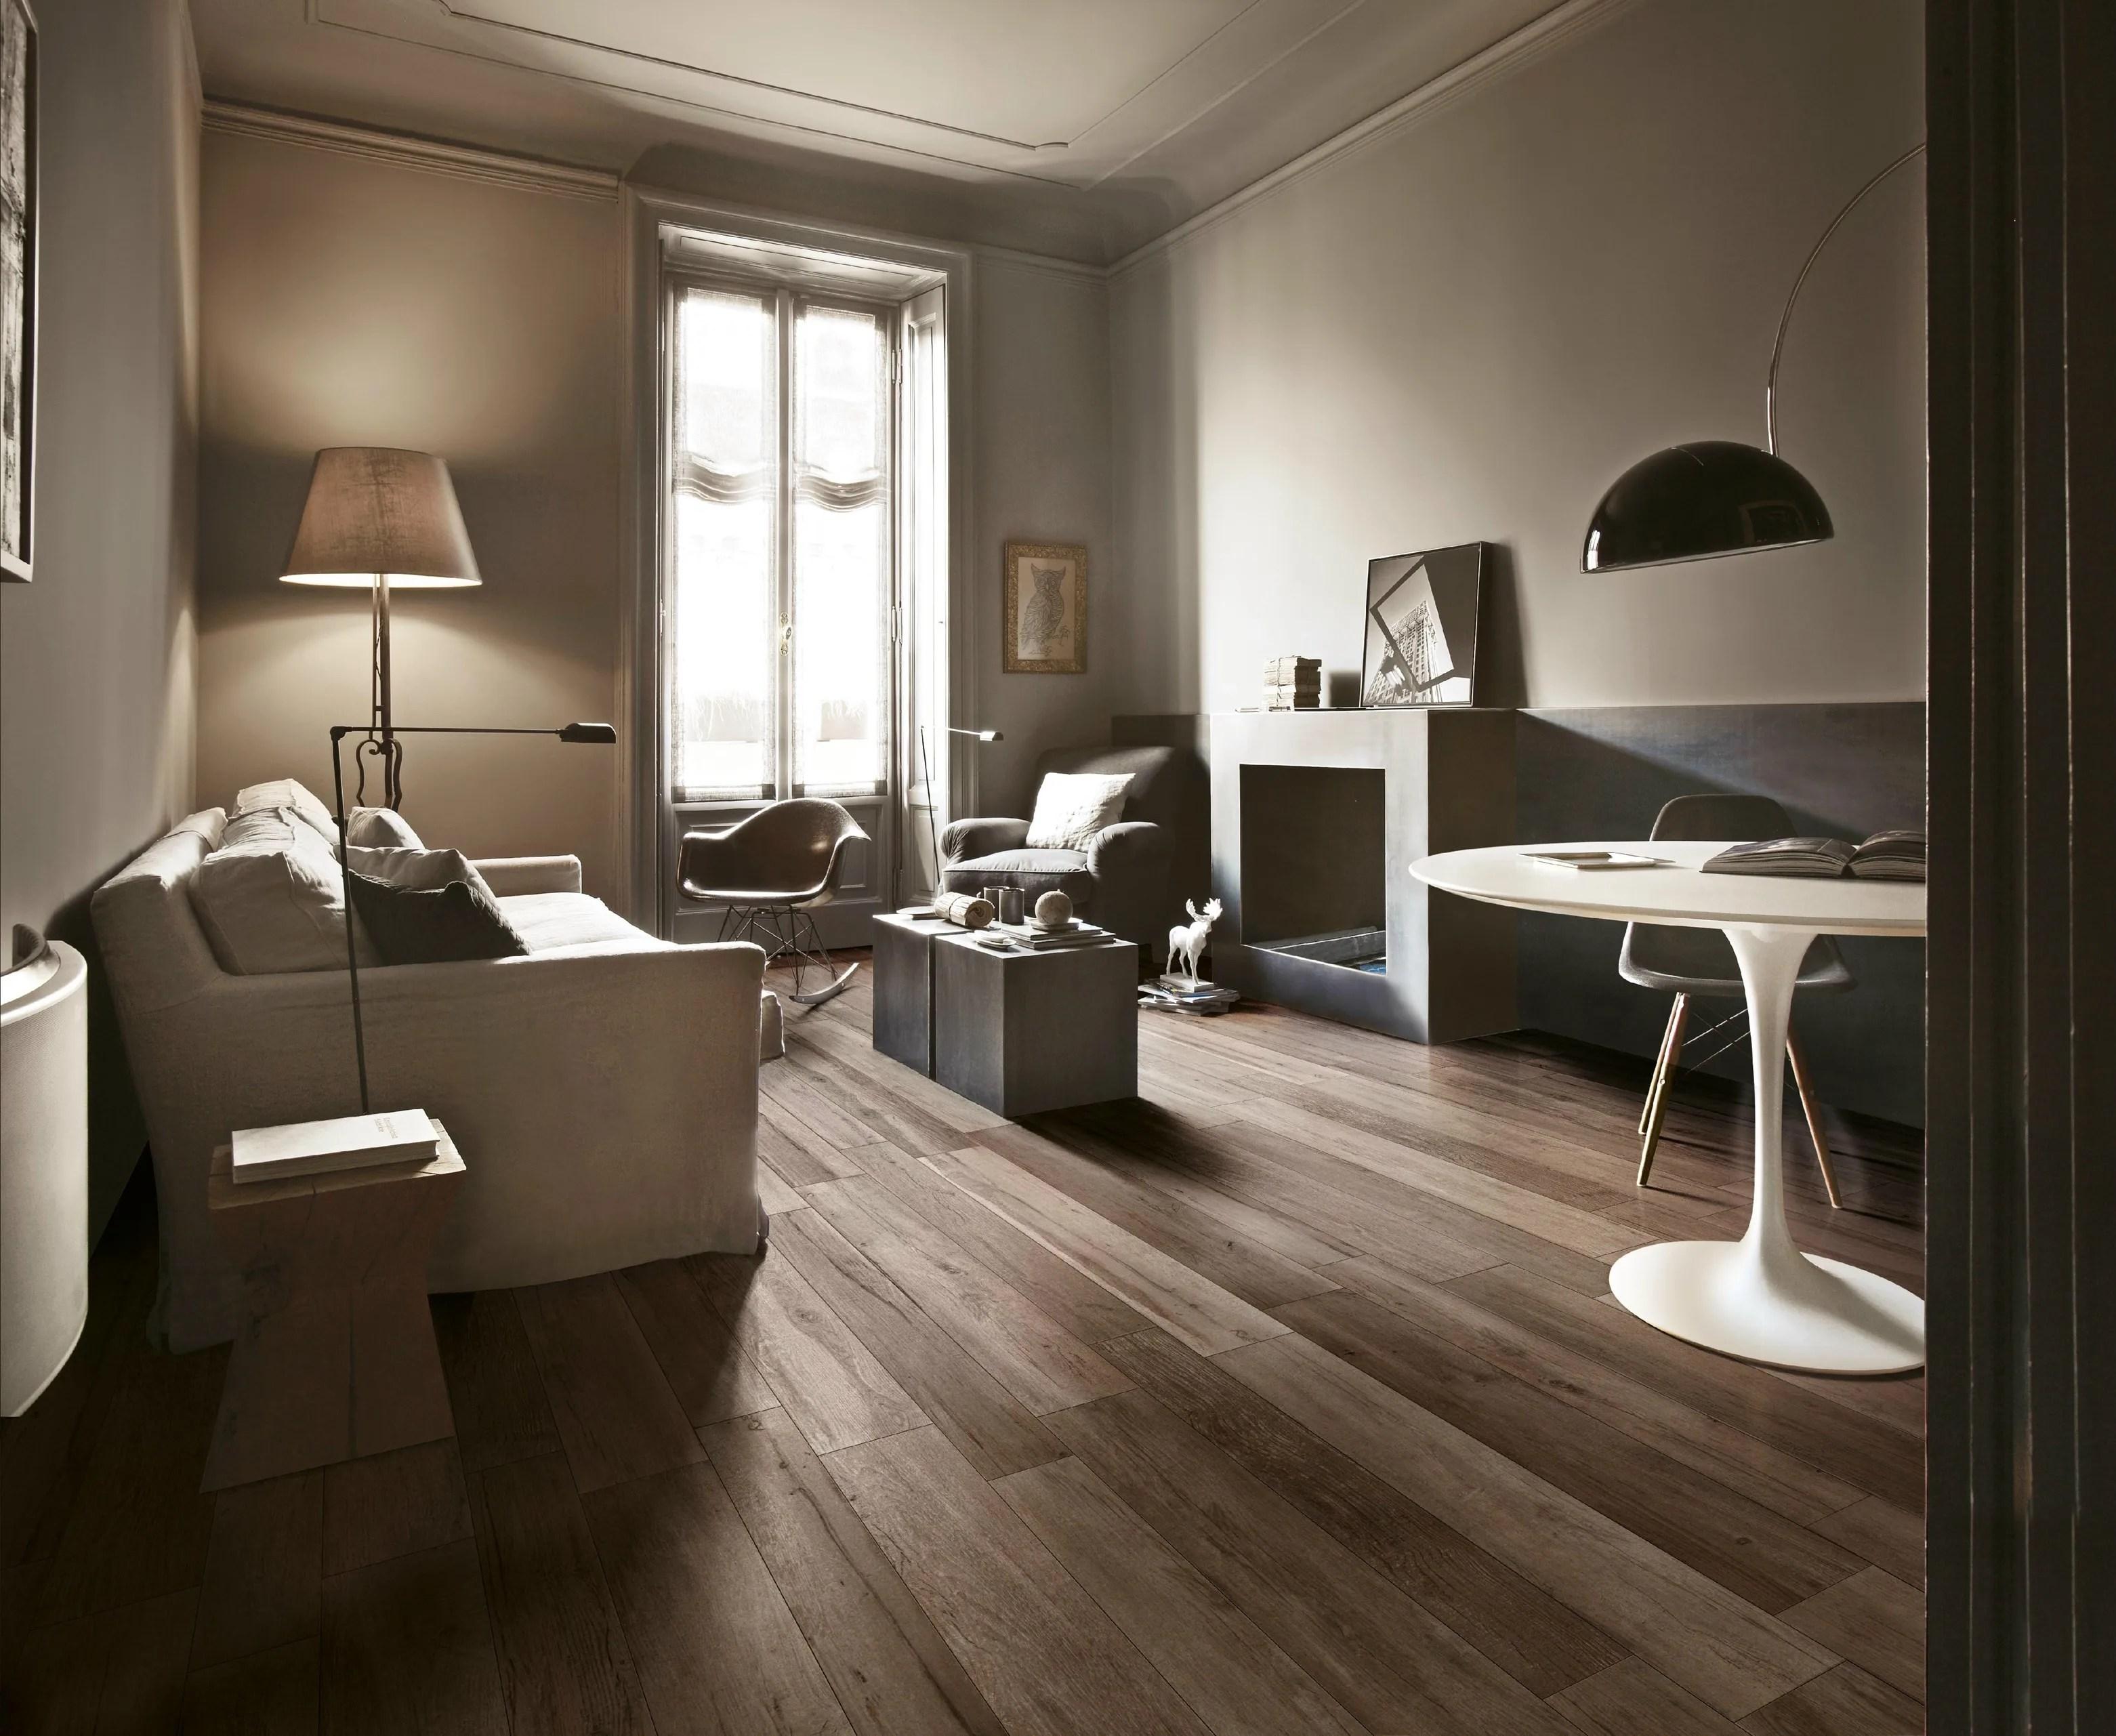 Idee Per Pavimenti Interni : Pavimenti per interni moderni pavimenti moderni